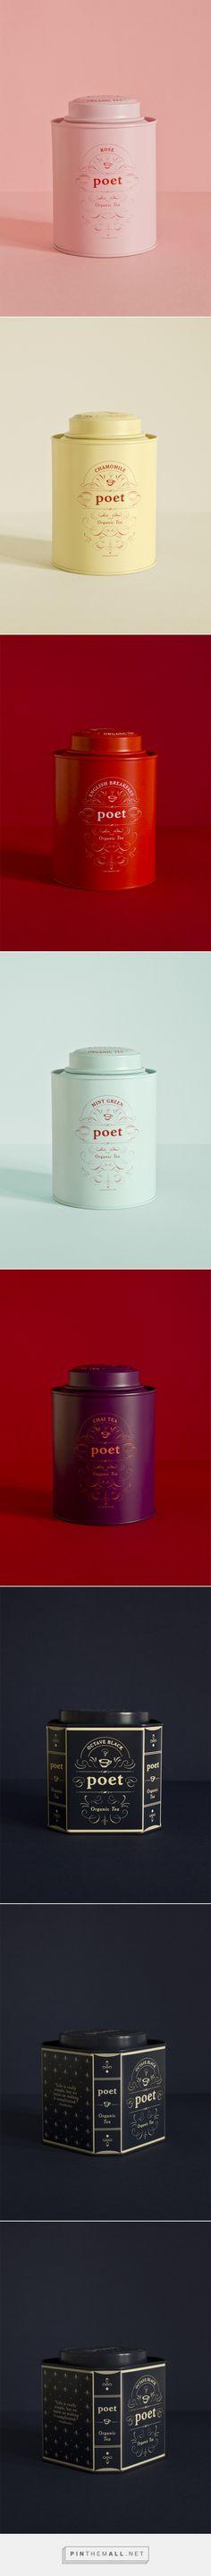 Cool Packaging, Tea Packaging, Brand Packaging, Wholesale Tea, Tea Container, Tea Places, Tea Design, Tea Brands, Bottle Design